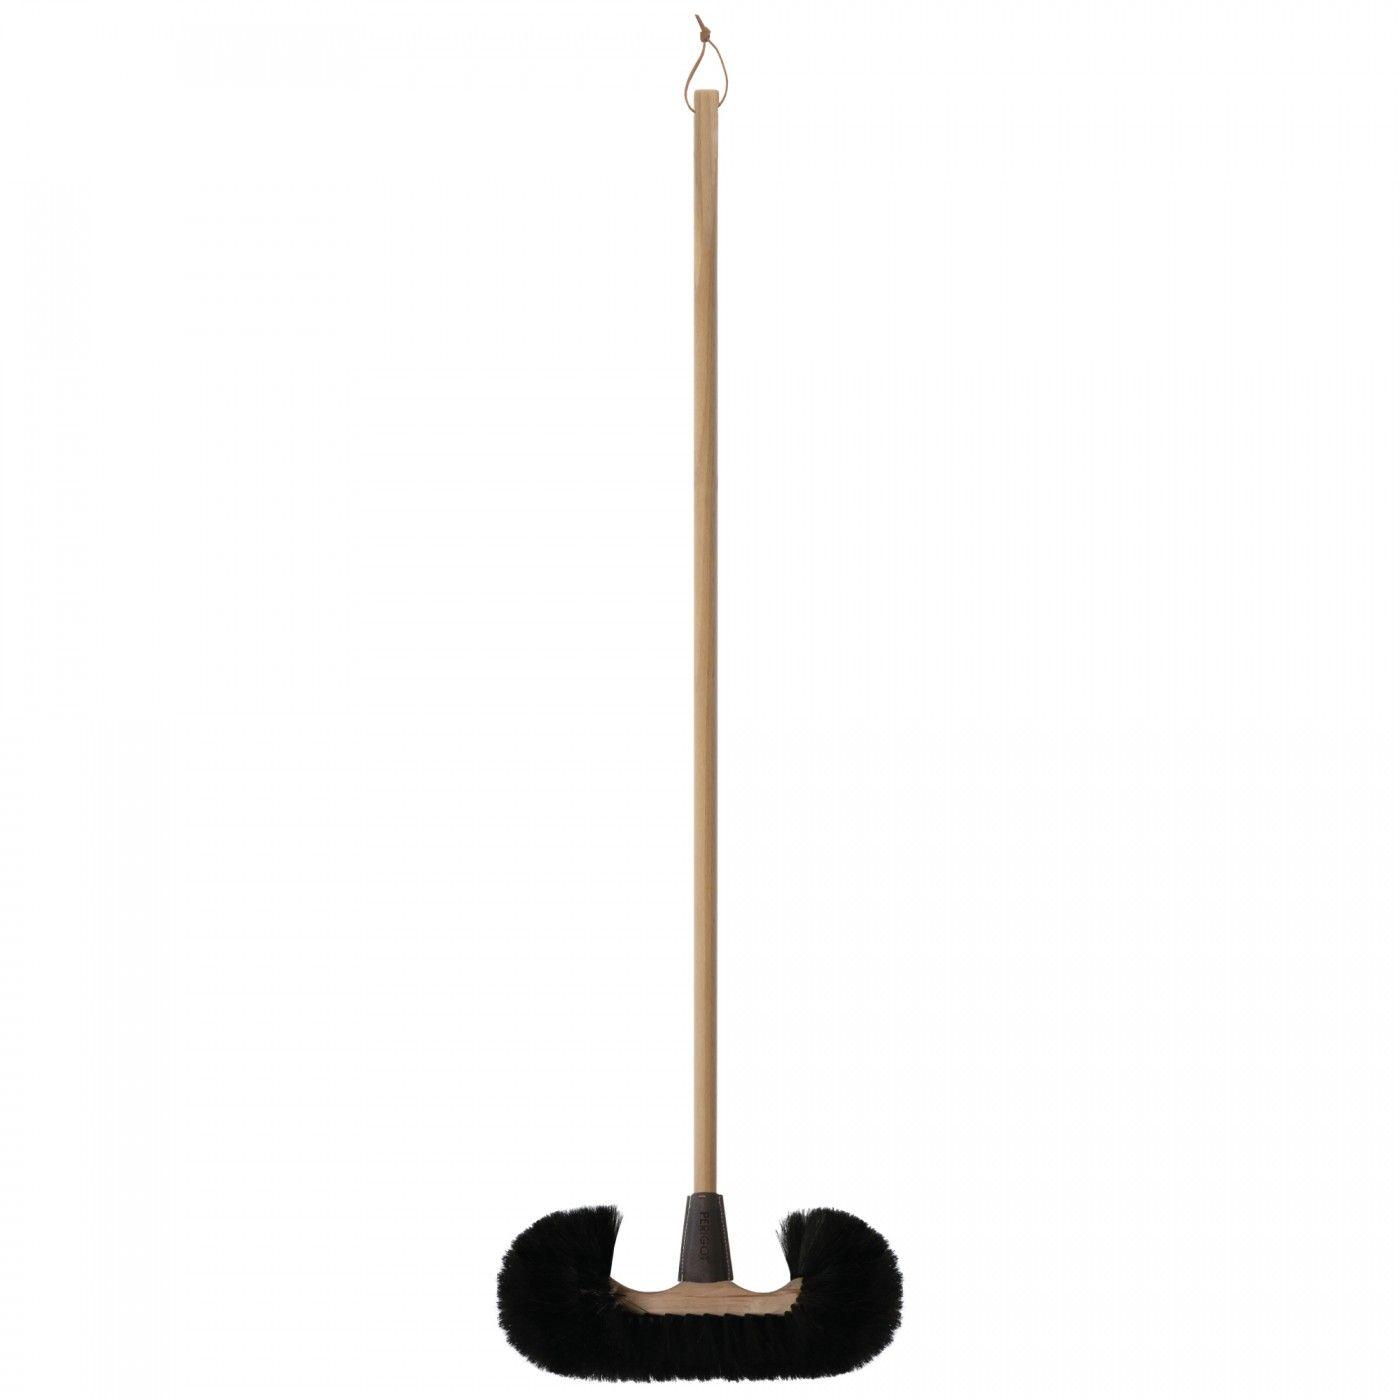 perigot design utilitaire viennese broom site officiel broom pinterest balai. Black Bedroom Furniture Sets. Home Design Ideas